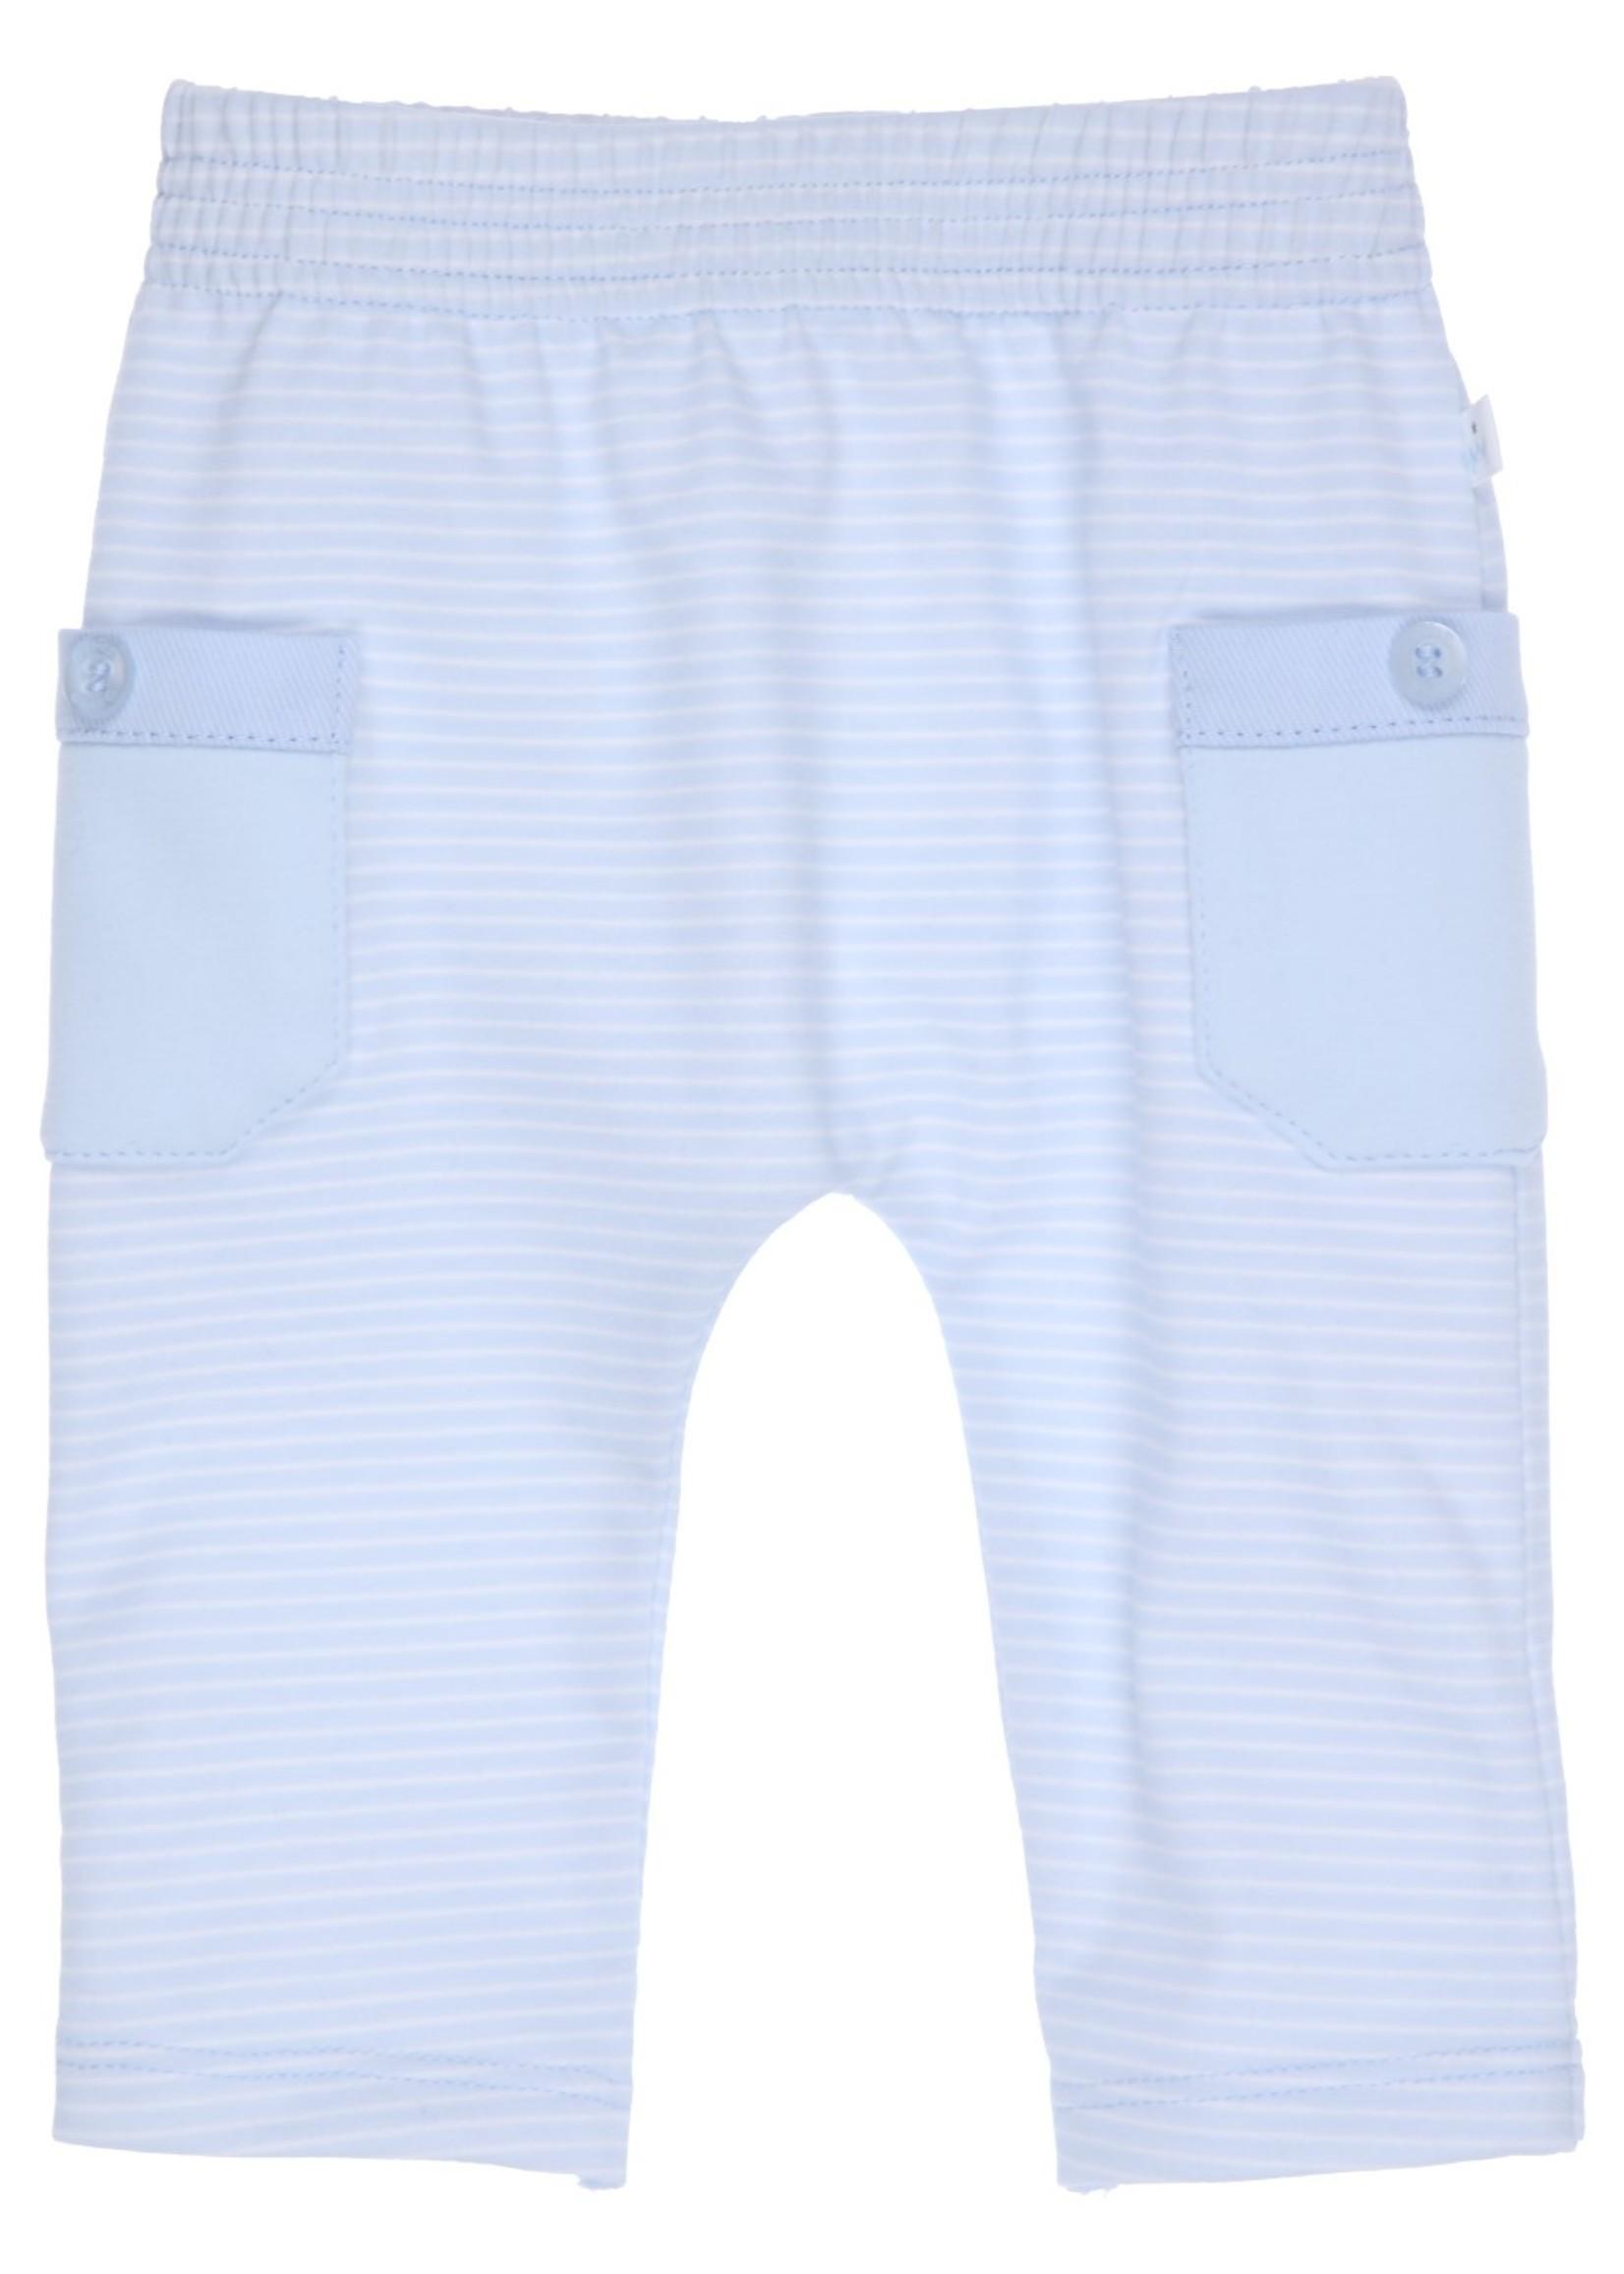 Gymp Gymp trousers pockets lichtblauw wit